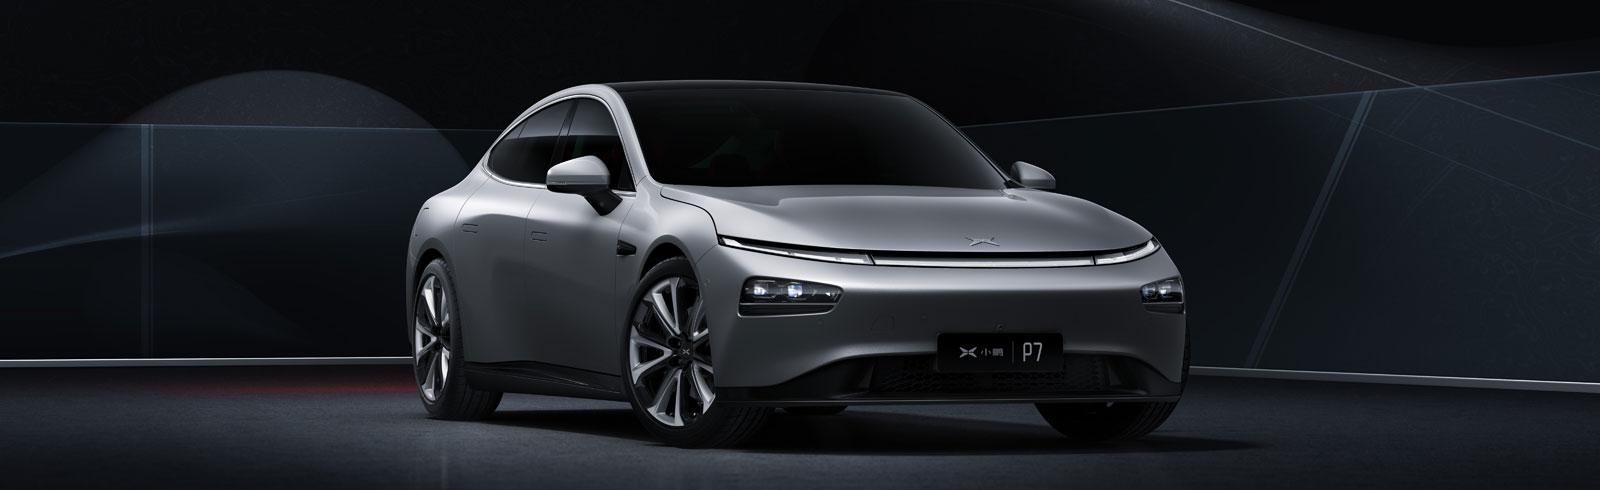 XPeng has produced 10,000 units of its P7 smart EV sedan